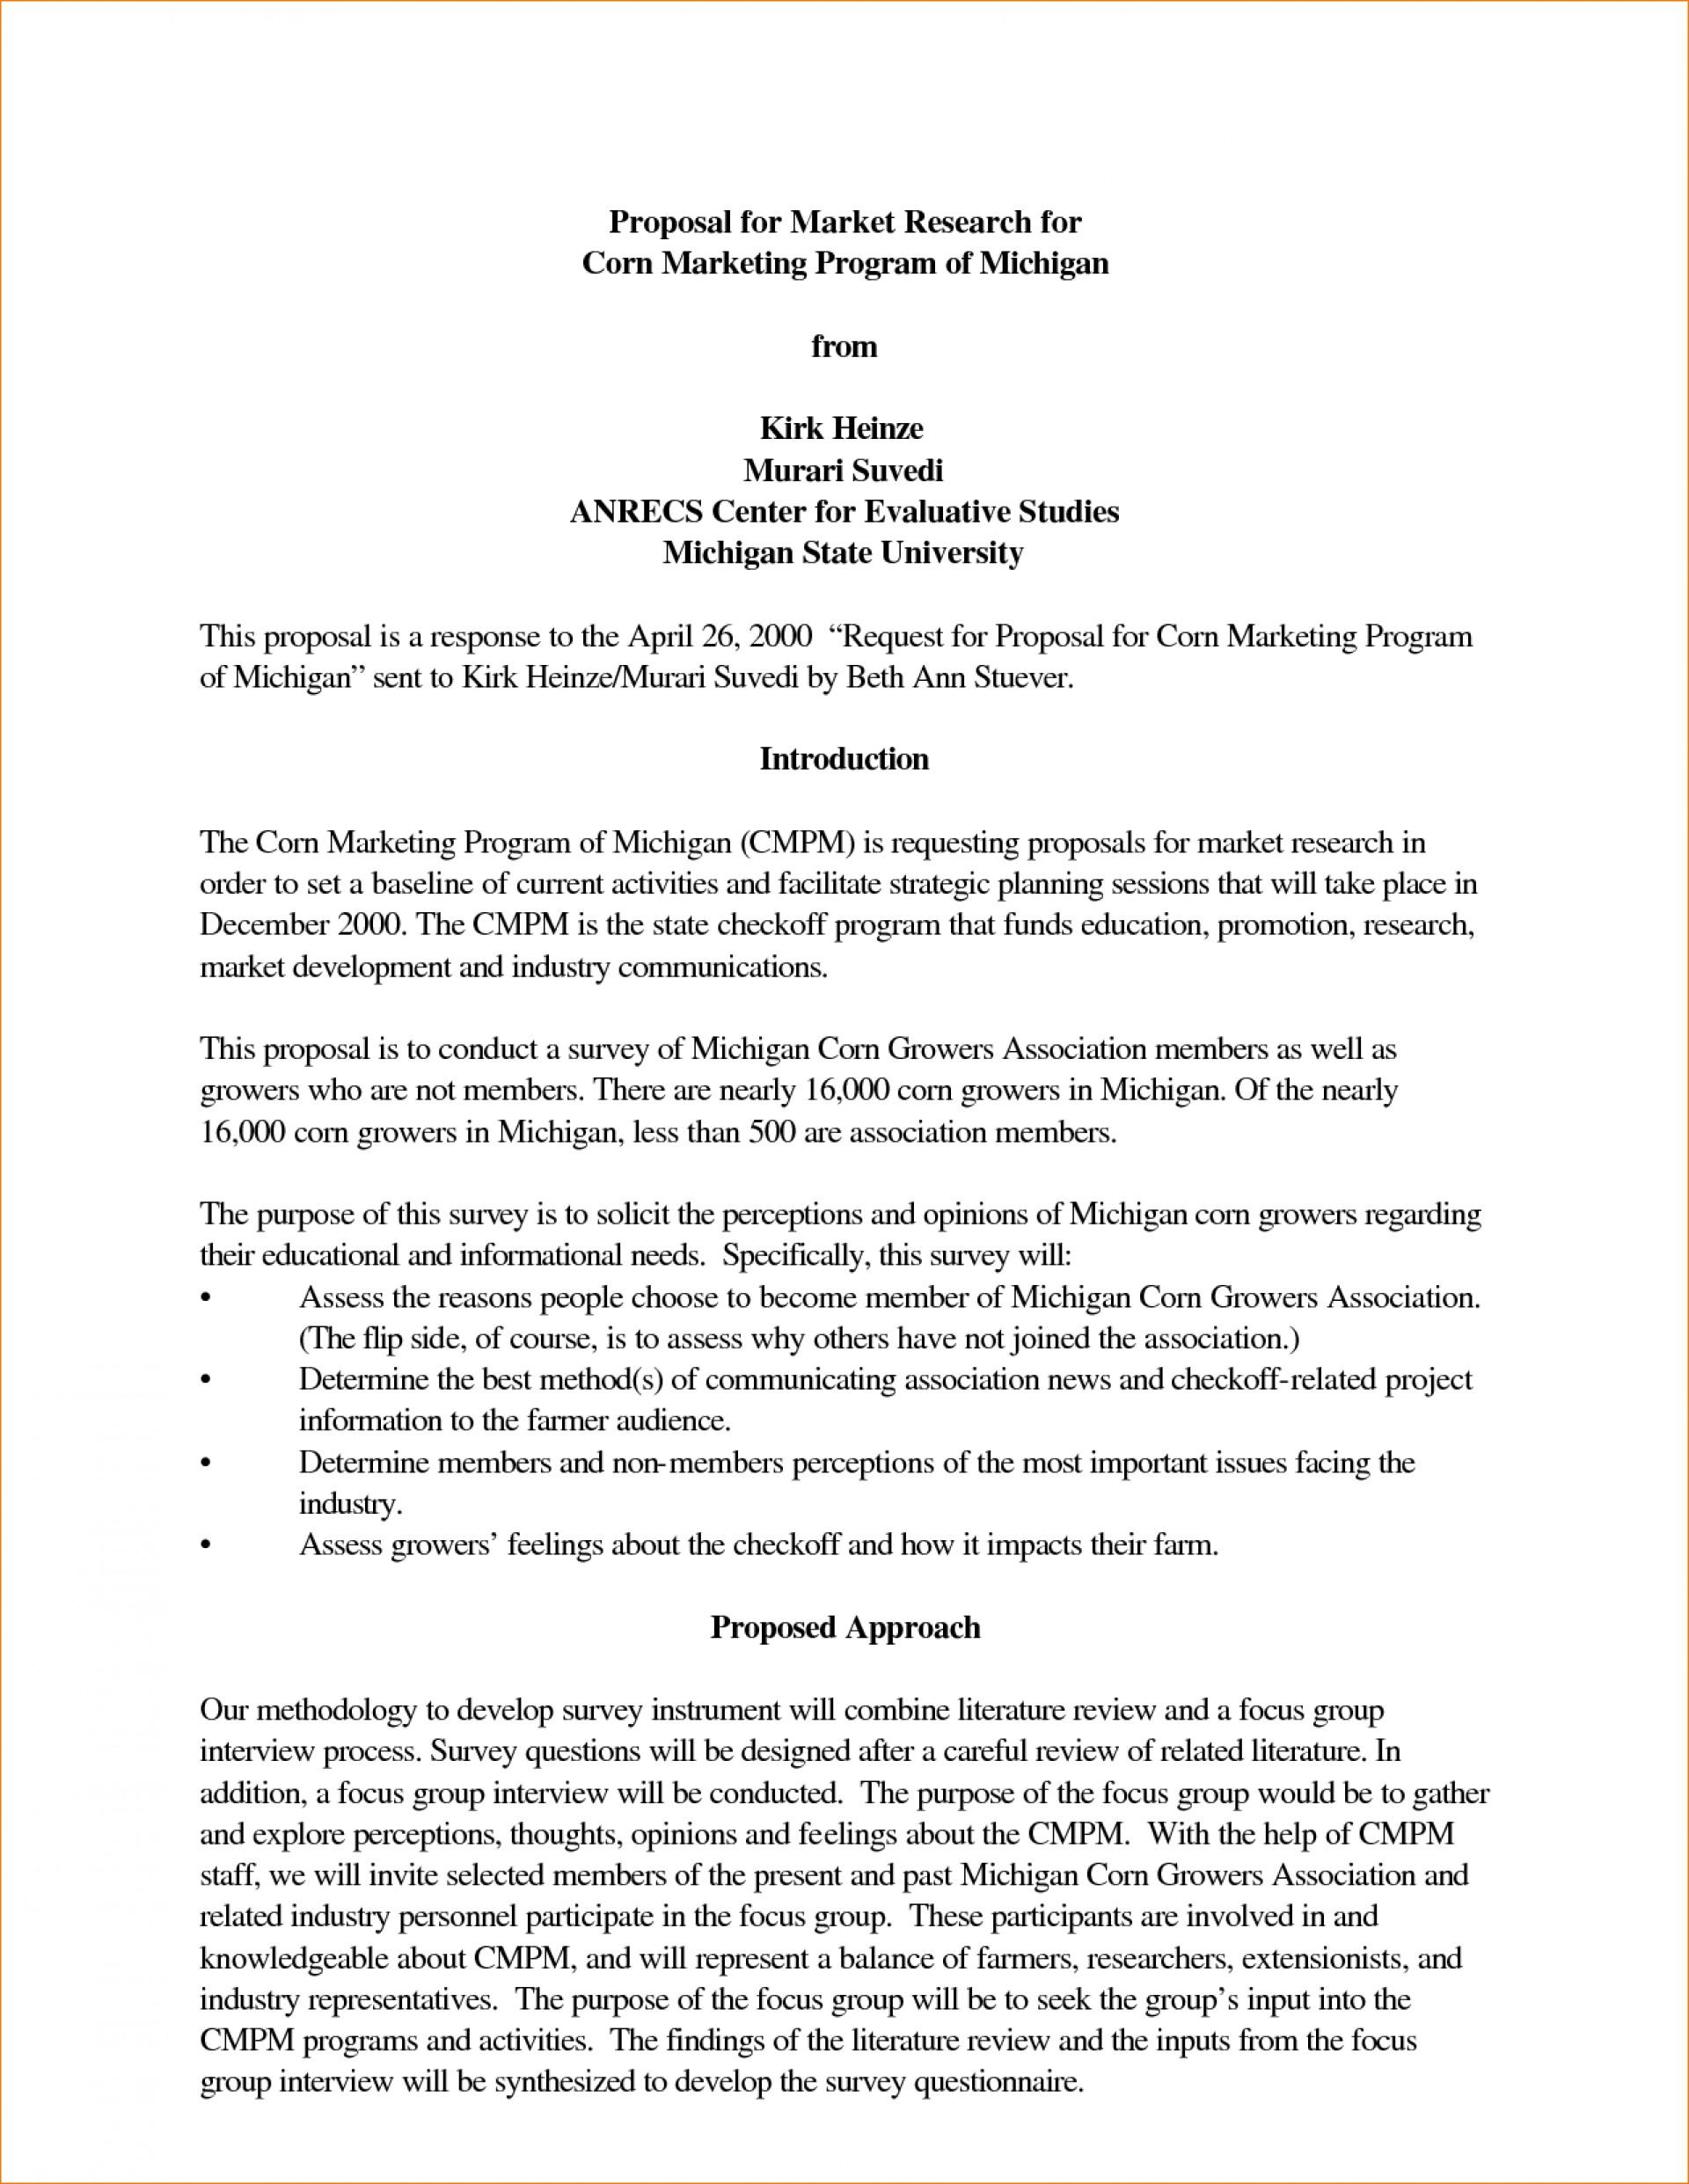 007 Essay Pdf Example Unbelievable Gujarati Free Download Argumentative Terrorism 1920